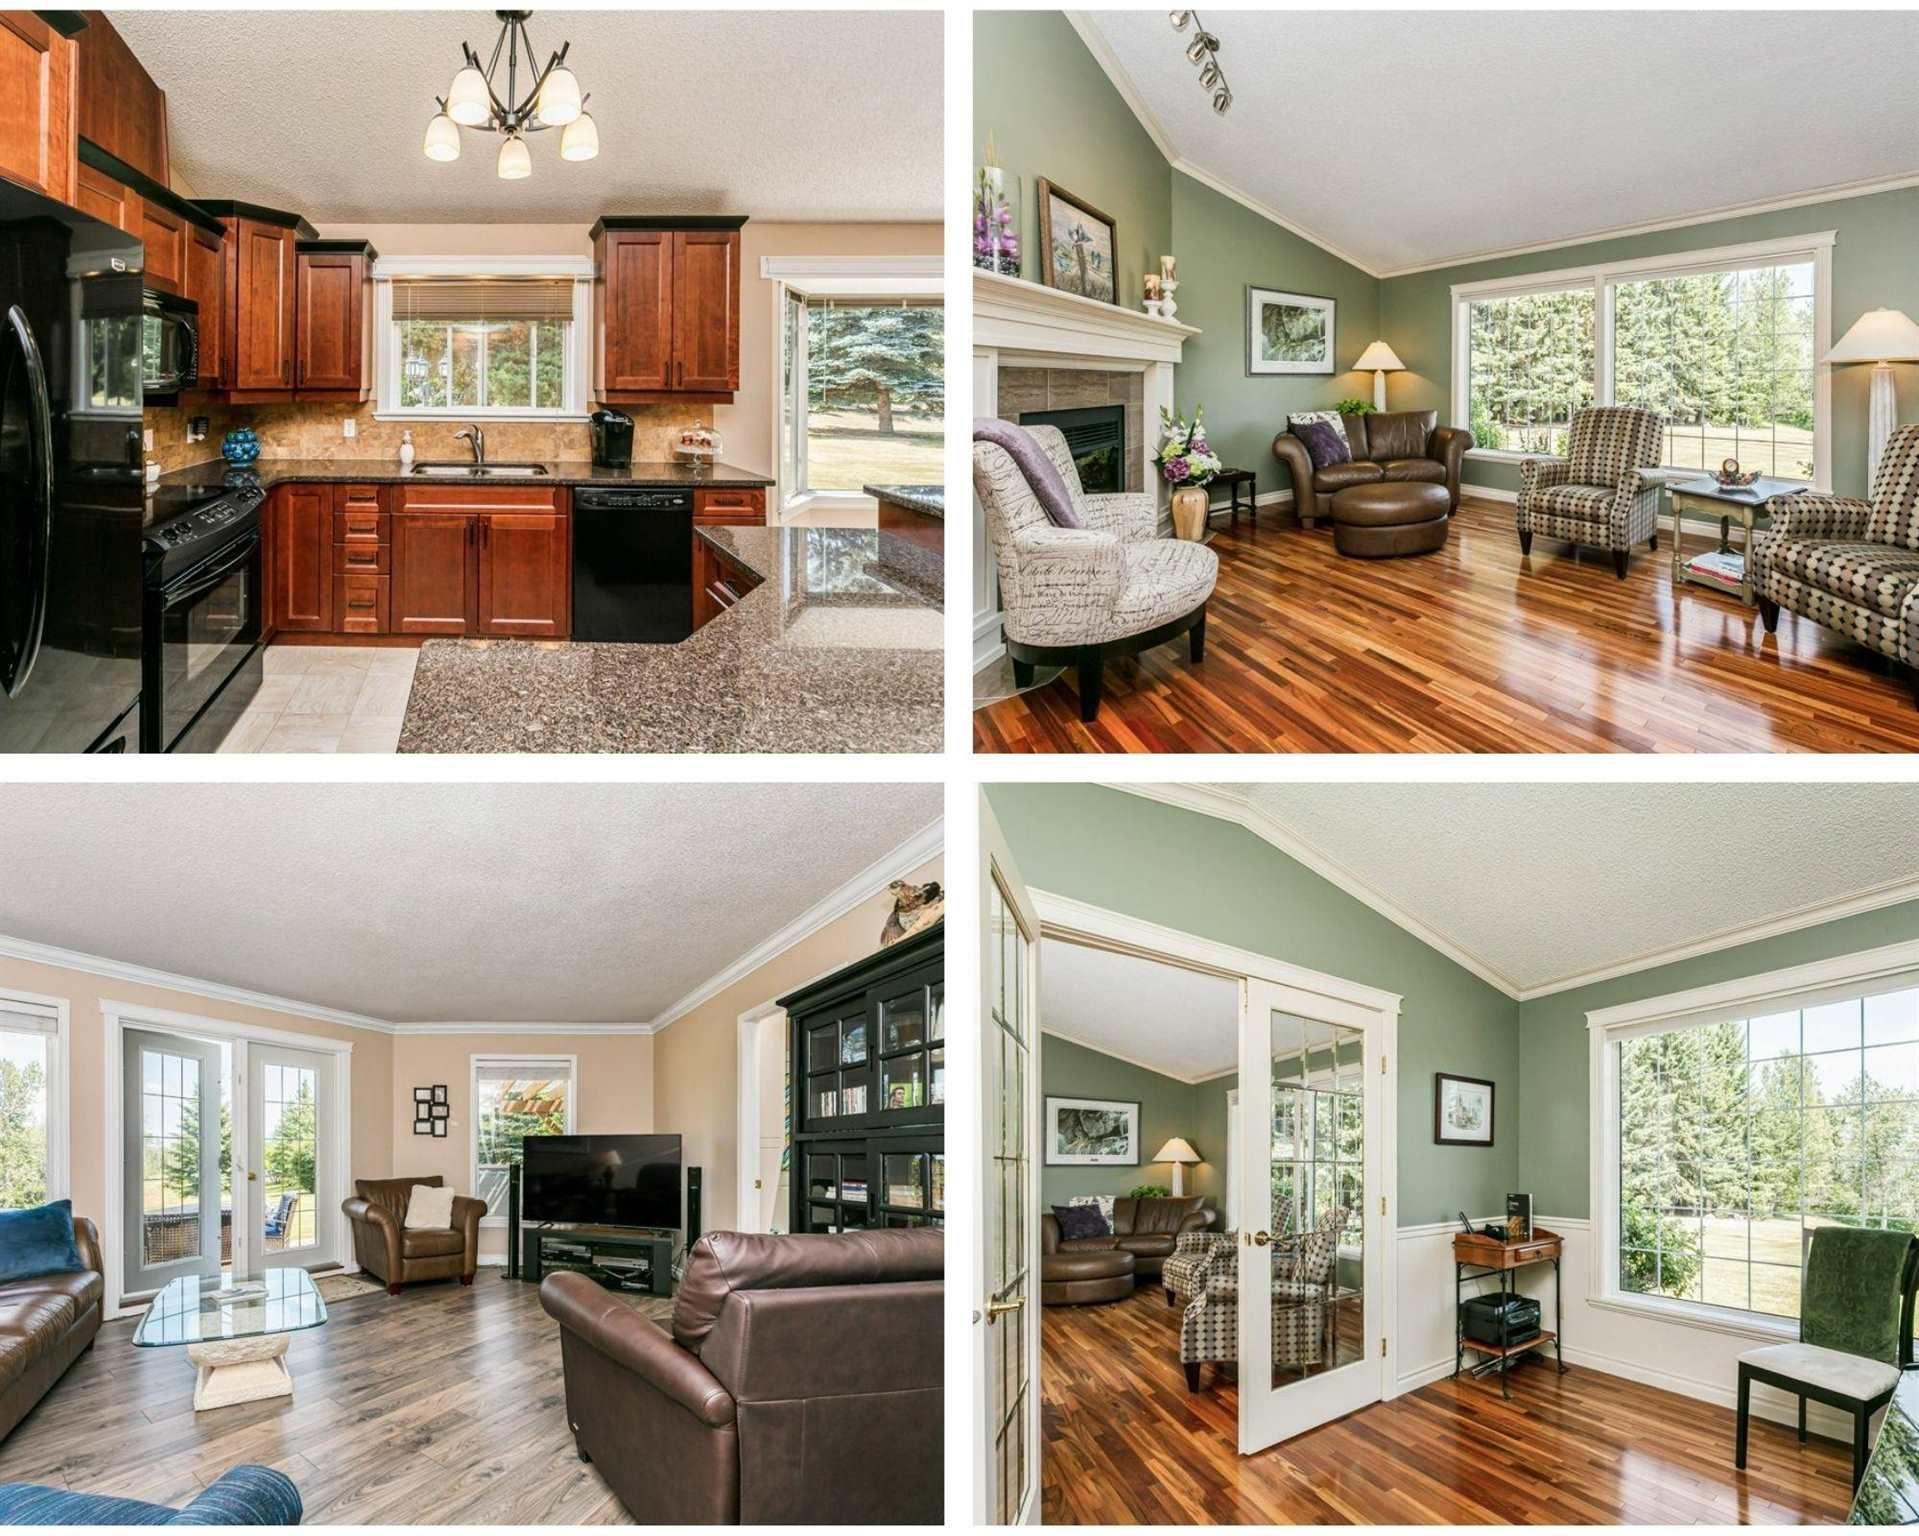 Main Photo: 53 HEWITT Drive: Rural Sturgeon County House for sale : MLS®# E4253636